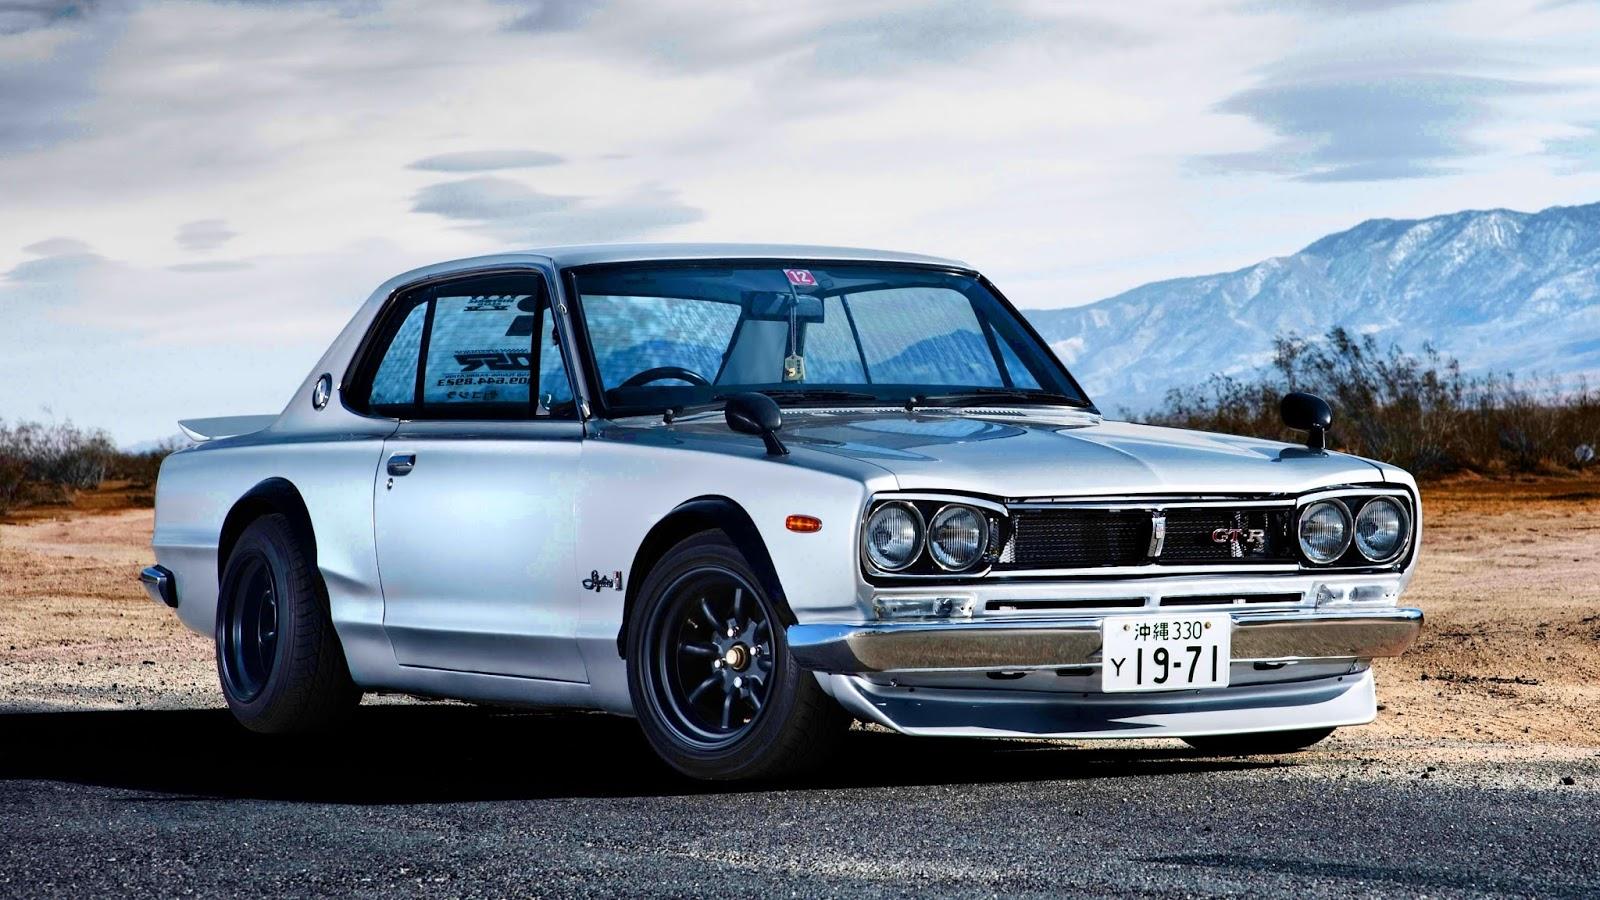 Hakosuka2BSkyline2BGT R Το πρώτης γενιάς Nissan Skyline GT-R οδηγείται όπως του αρμόζει